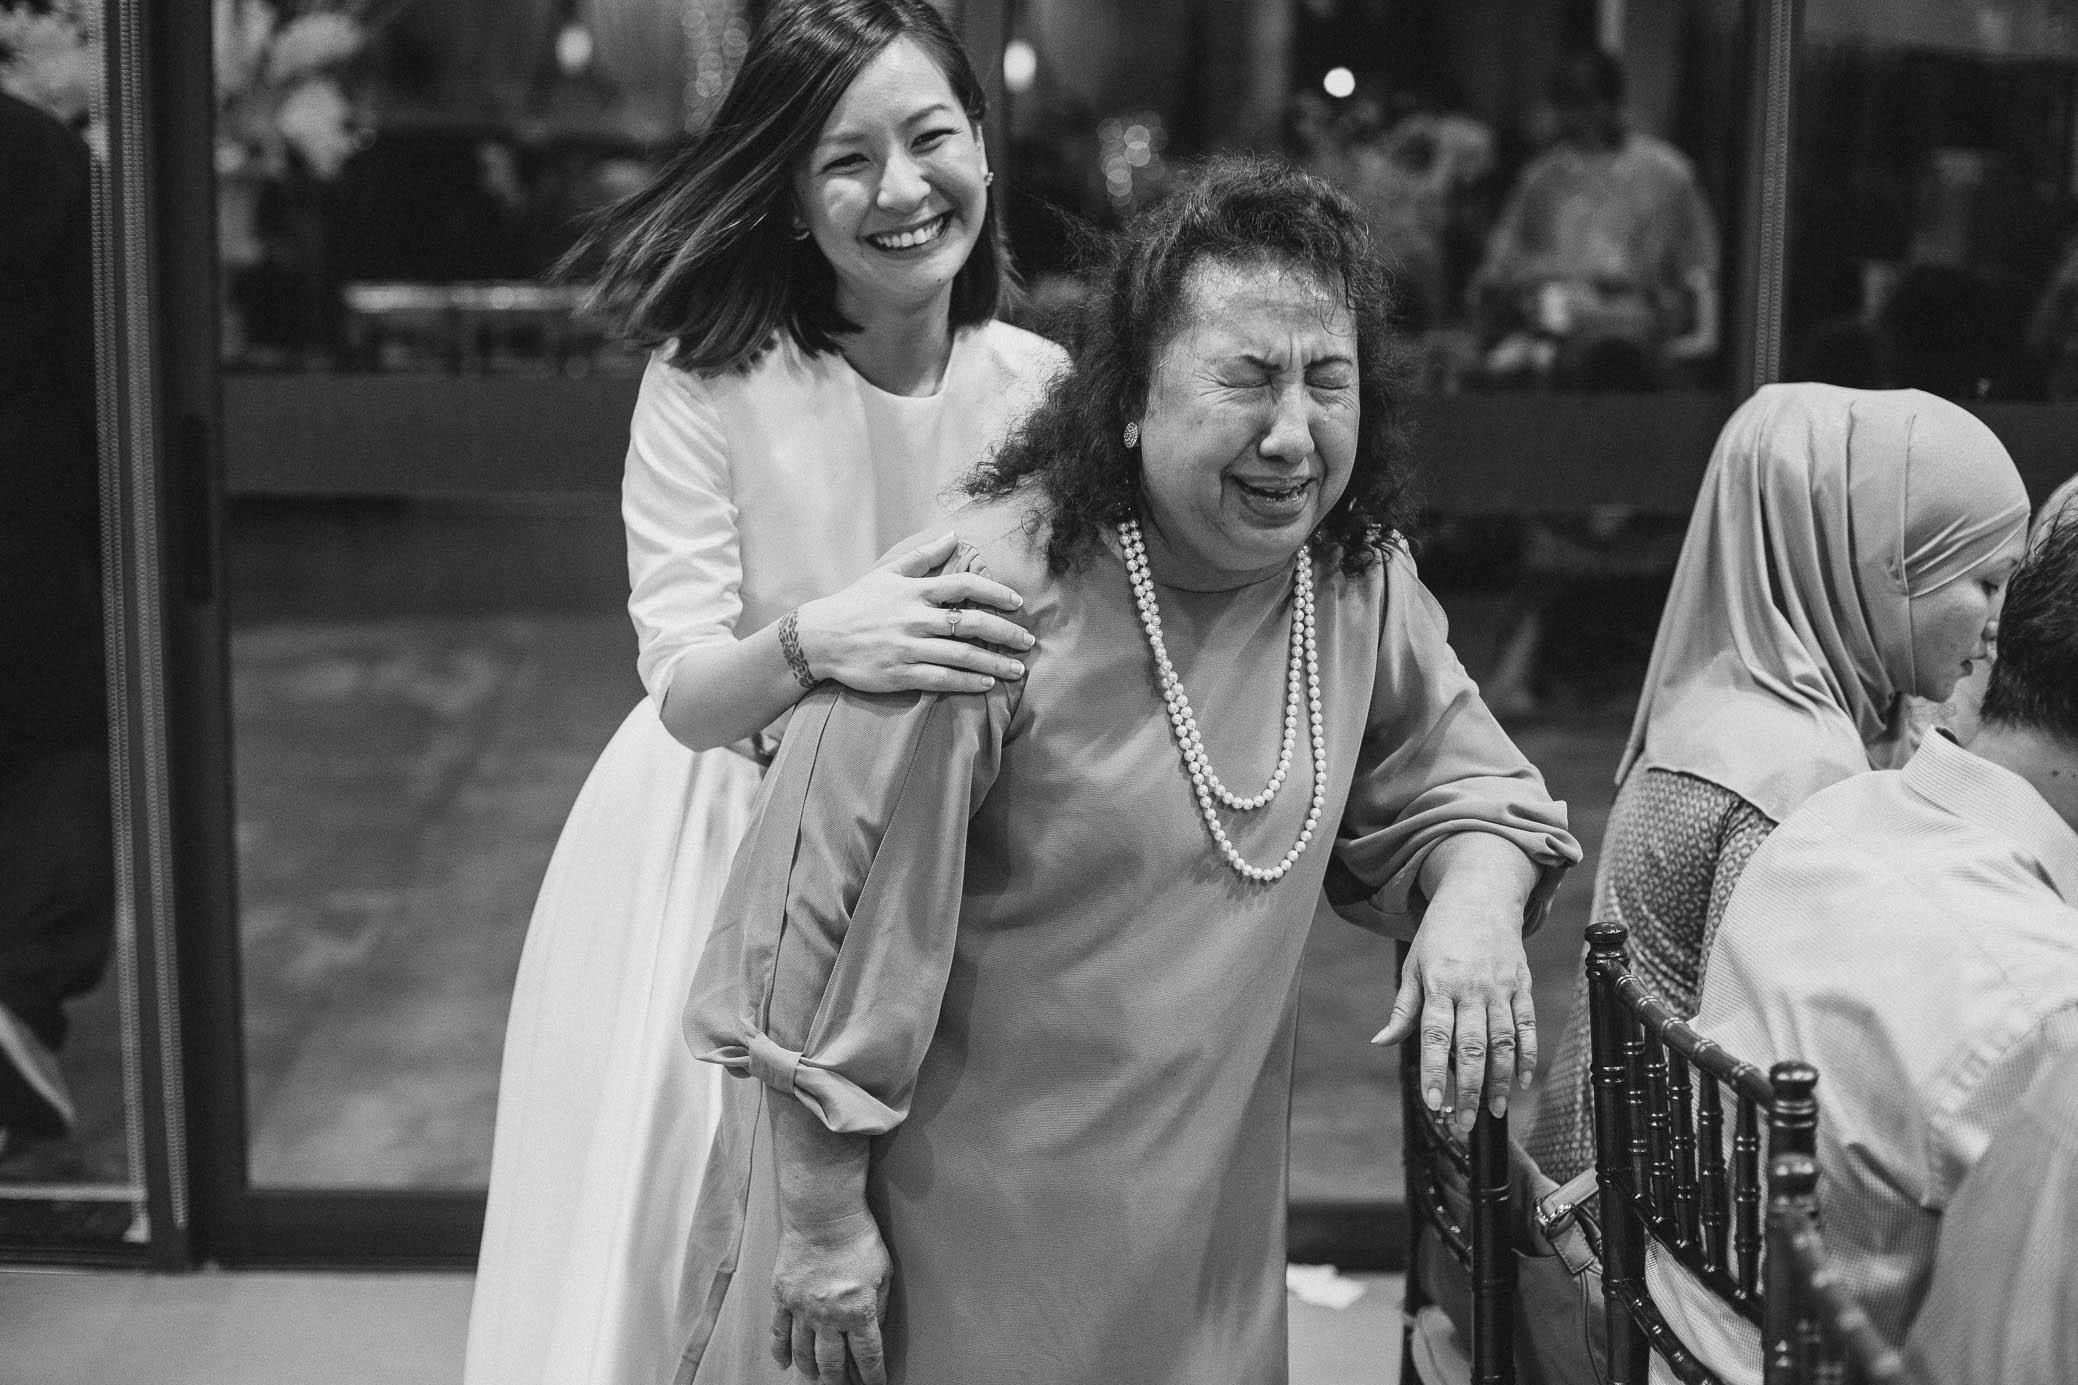 singapore-wedding-photographer-malay-indian-pre-wedding-travel-wmt-2015-alif-ethel-62.jpg